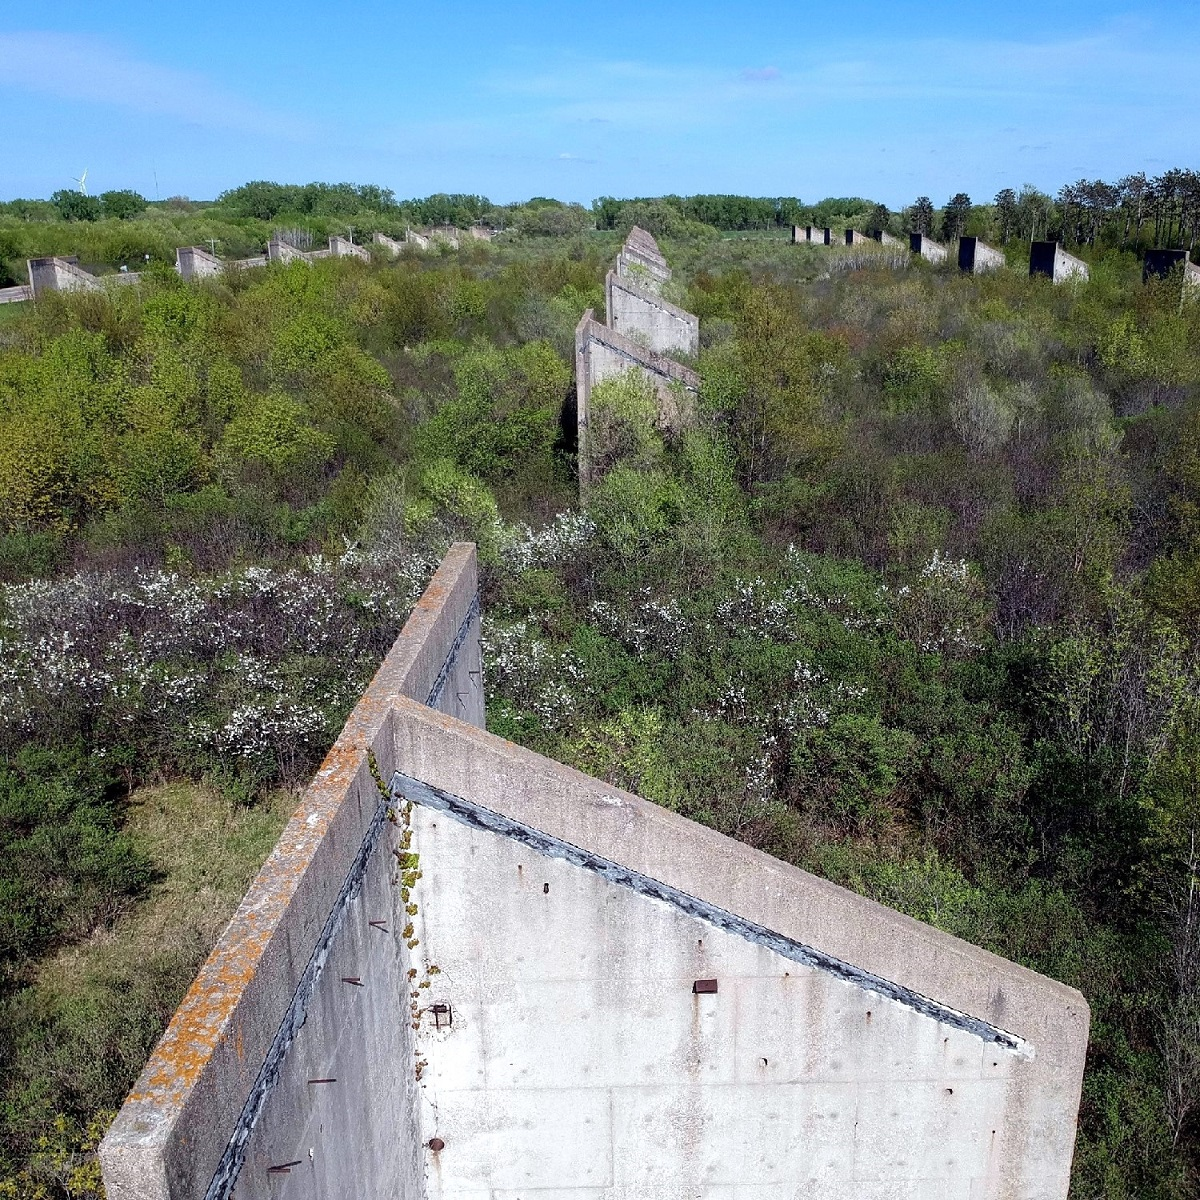 cementTstructureSMALL.jpg